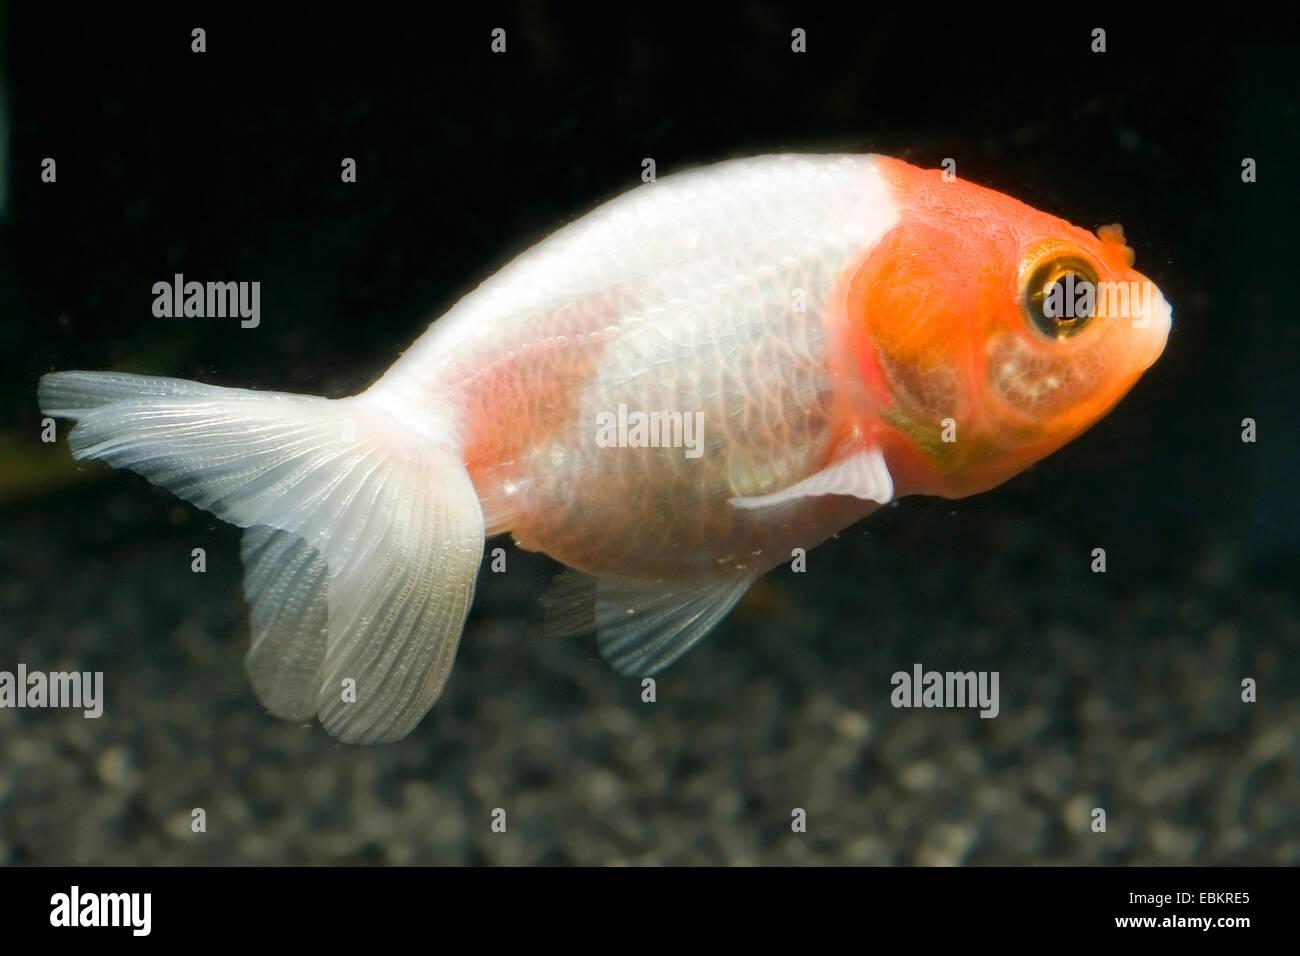 Goldfish, Common carp (Carassius auratus), breeding form red and white eggfish Stock Photo